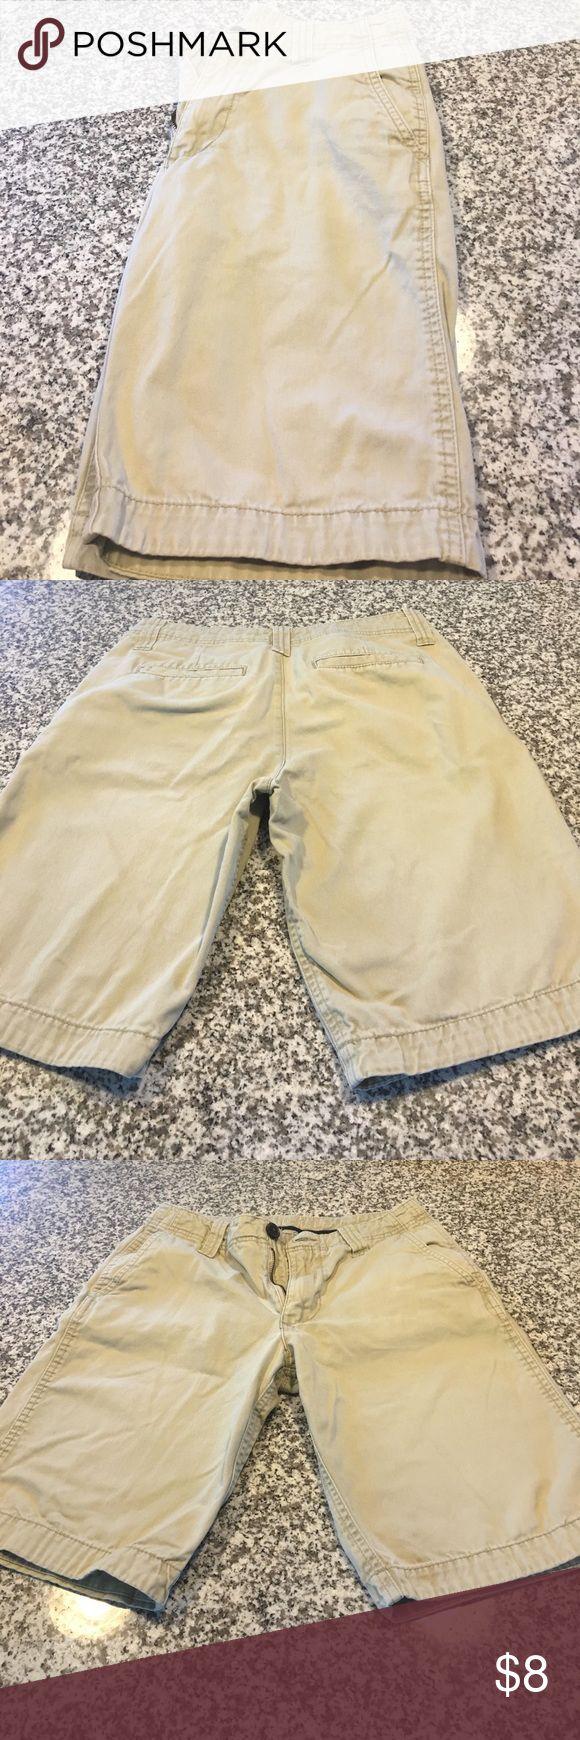 Men's cream shorts. Size 27 Men's flat front cream shorts with front pockets. Shorts Flat Front